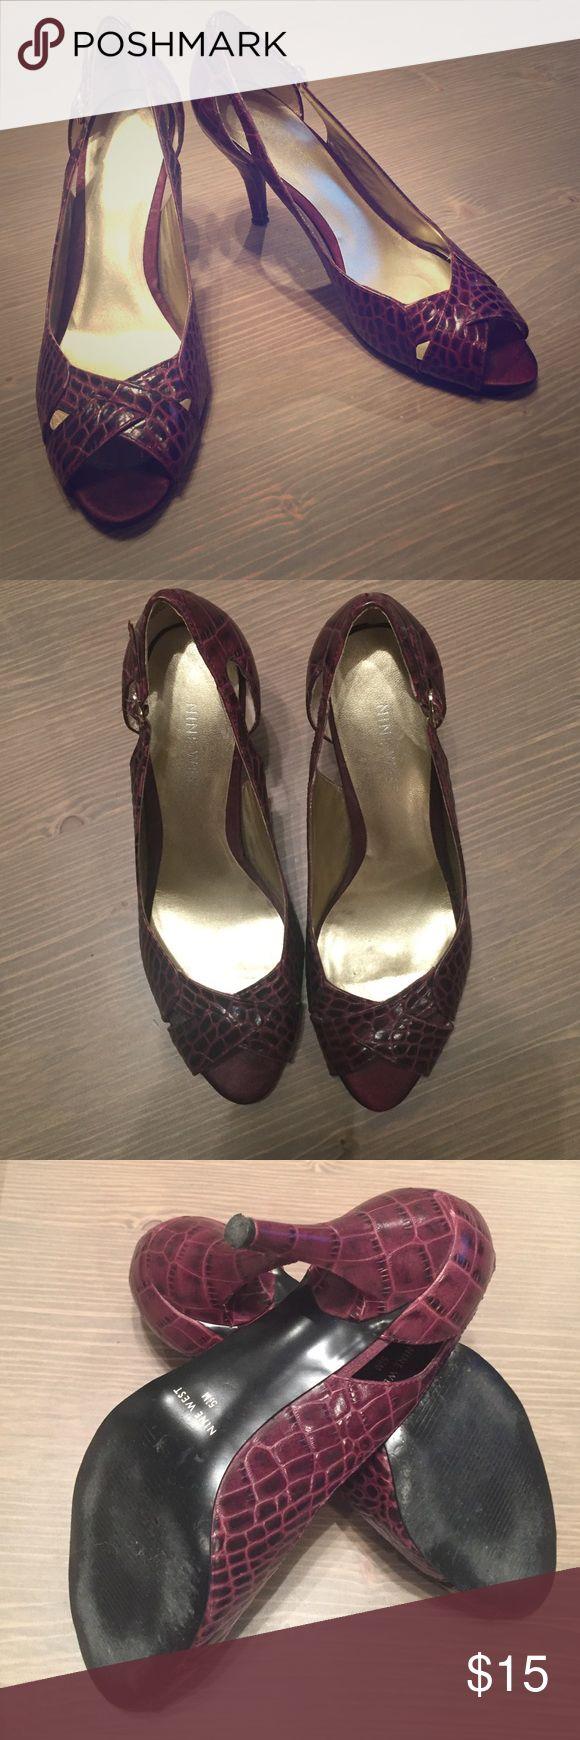 Nine West Bright Girl heels Leather faux crocodile peep toe. Nine West Shoes Heels